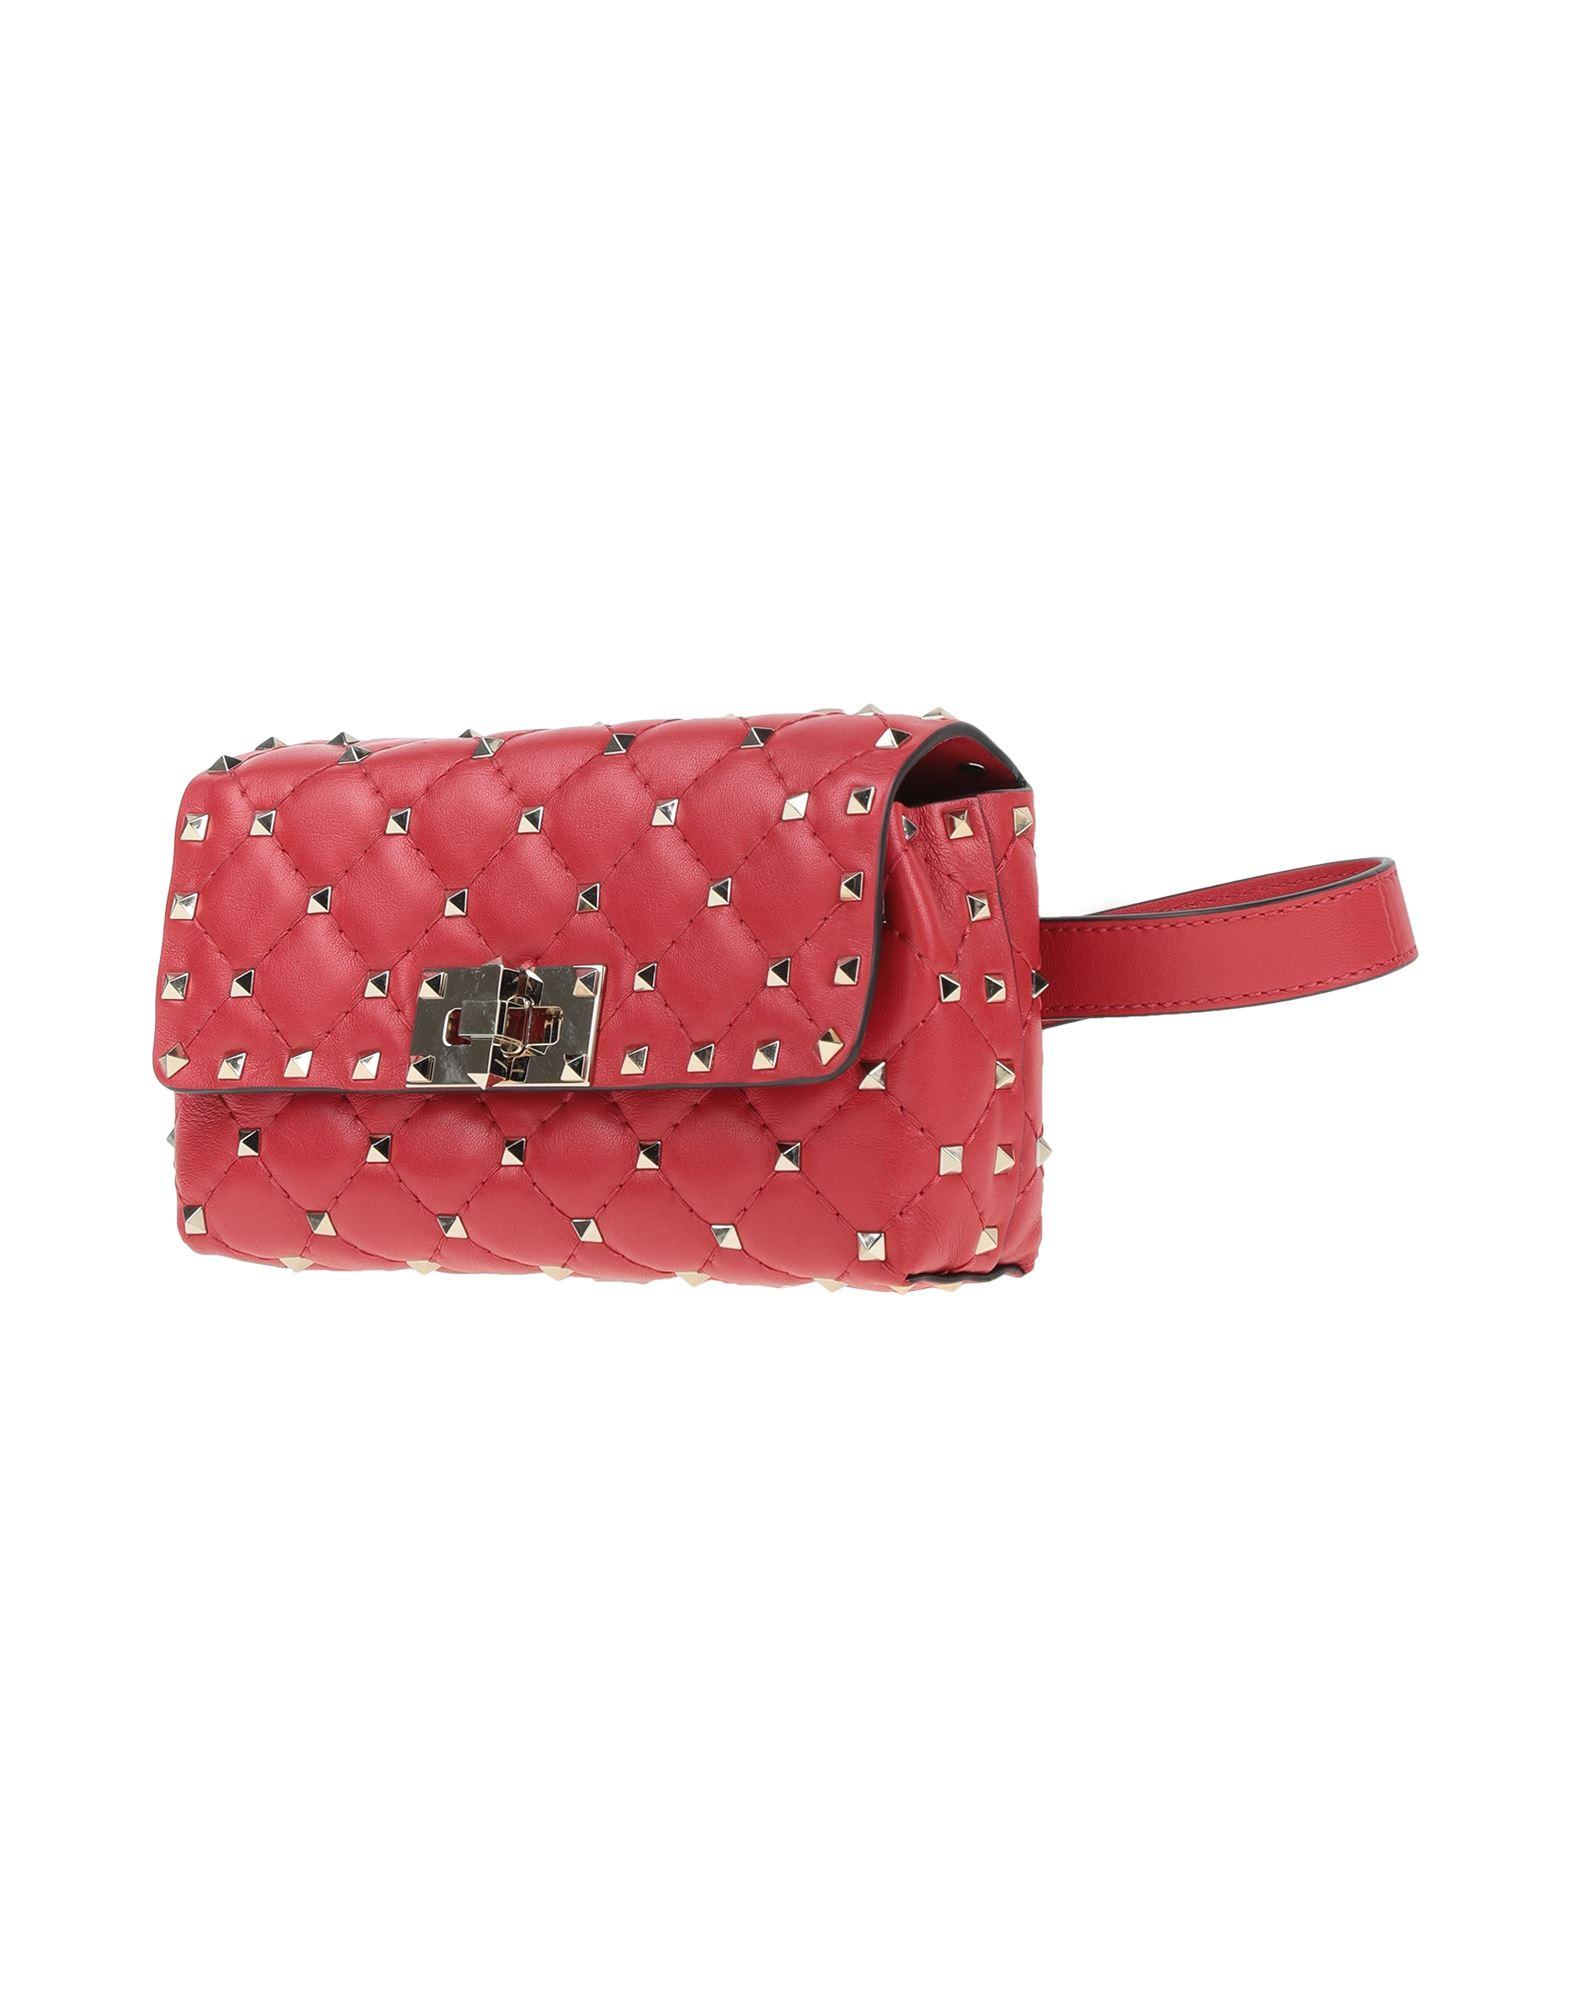 Фото - VALENTINO GARAVANI Поясная сумка valentino garavani аксессуары для сумок